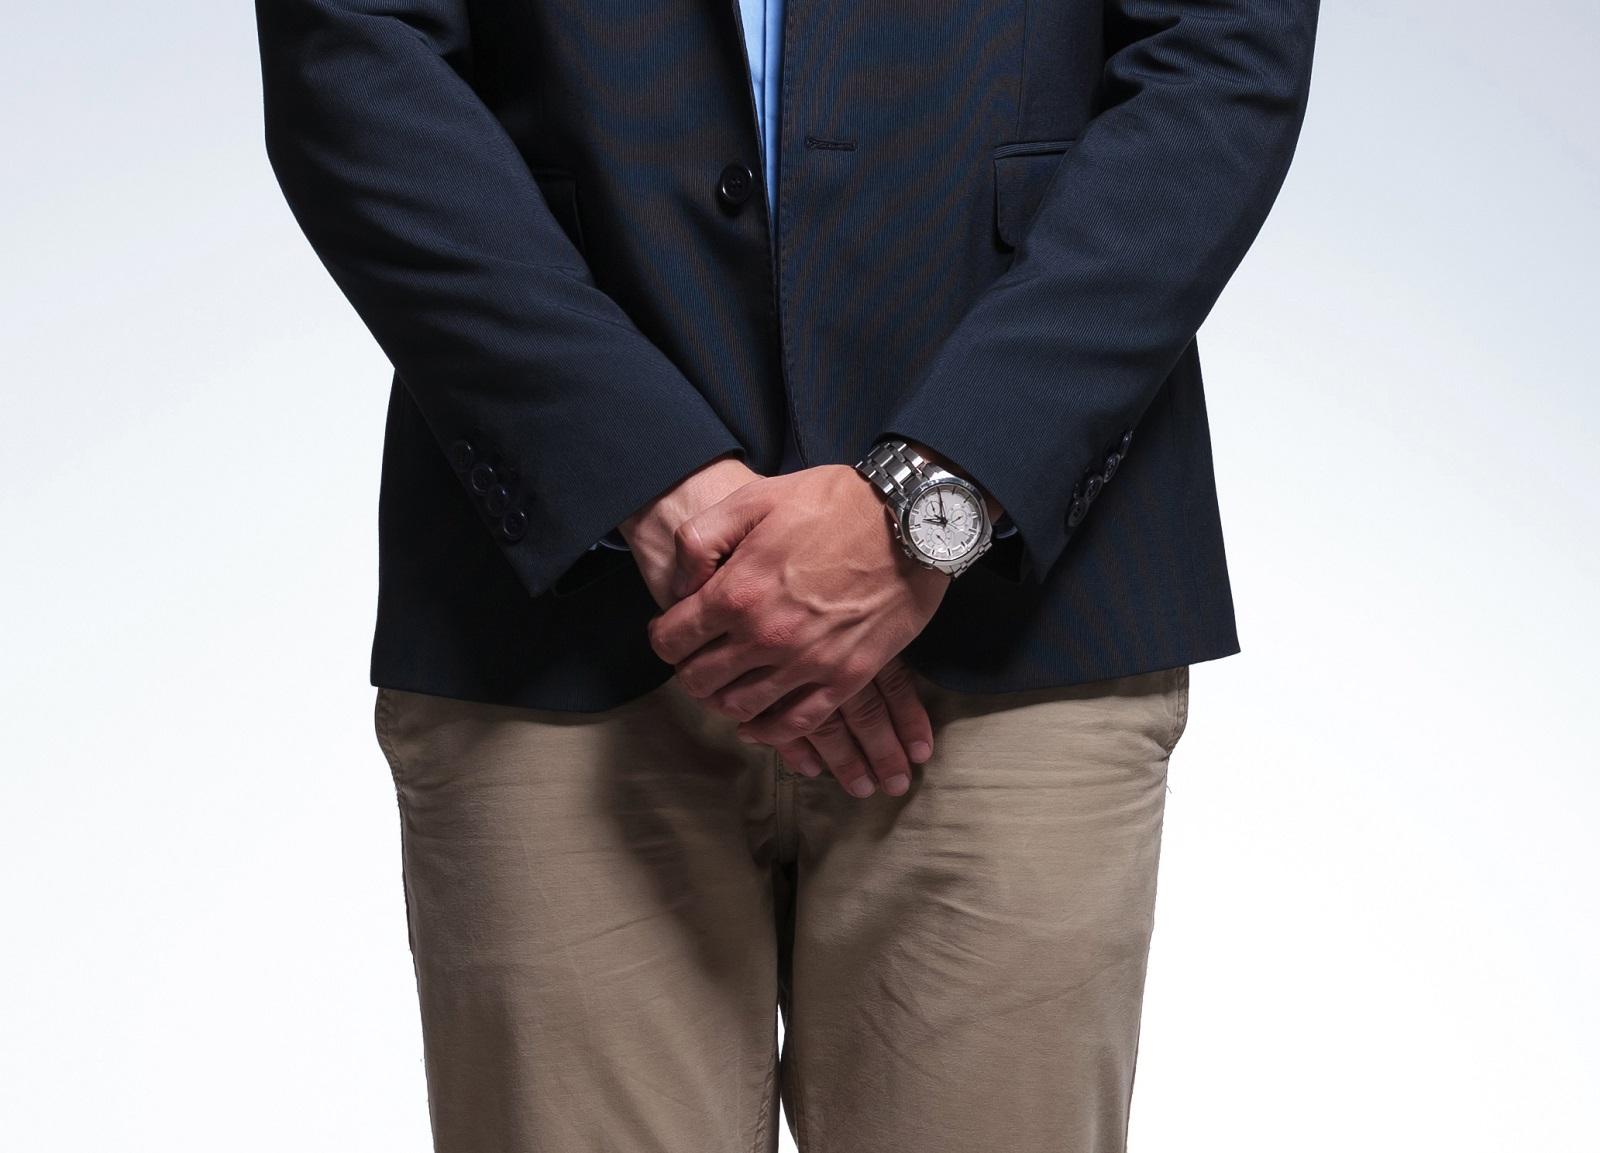 Кандидоз у мужчин: фото, симптомы, лечение